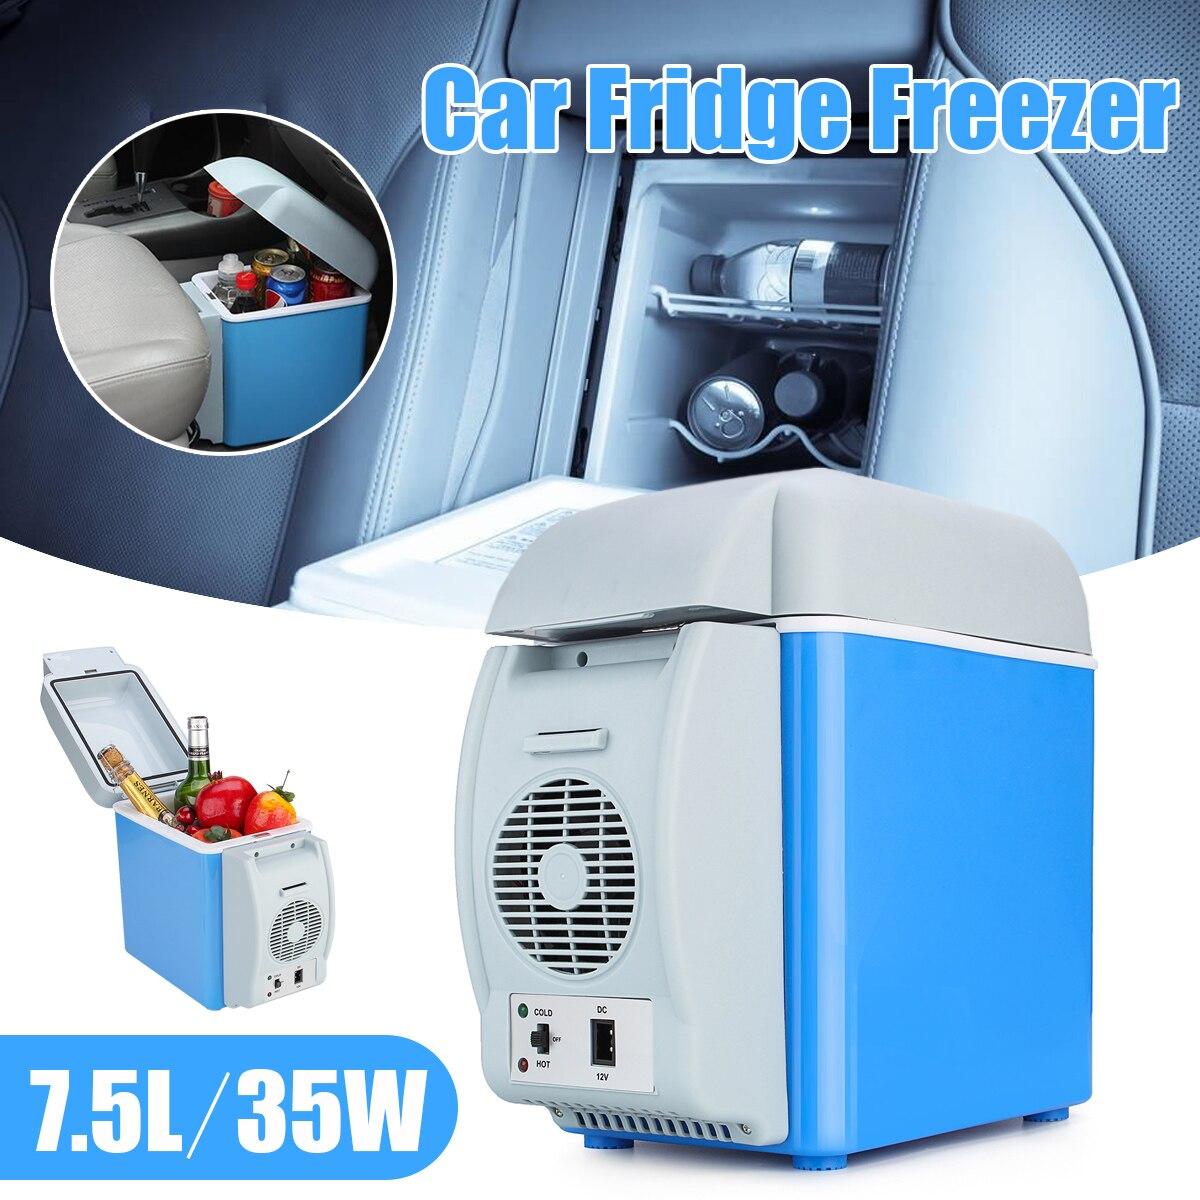 New 12V 7.5L Mini Portable Car Refrigerator Travel Cooler Freezer Car Fridge Freezer Cooler Warmer 2 Modes Temperature Control цена